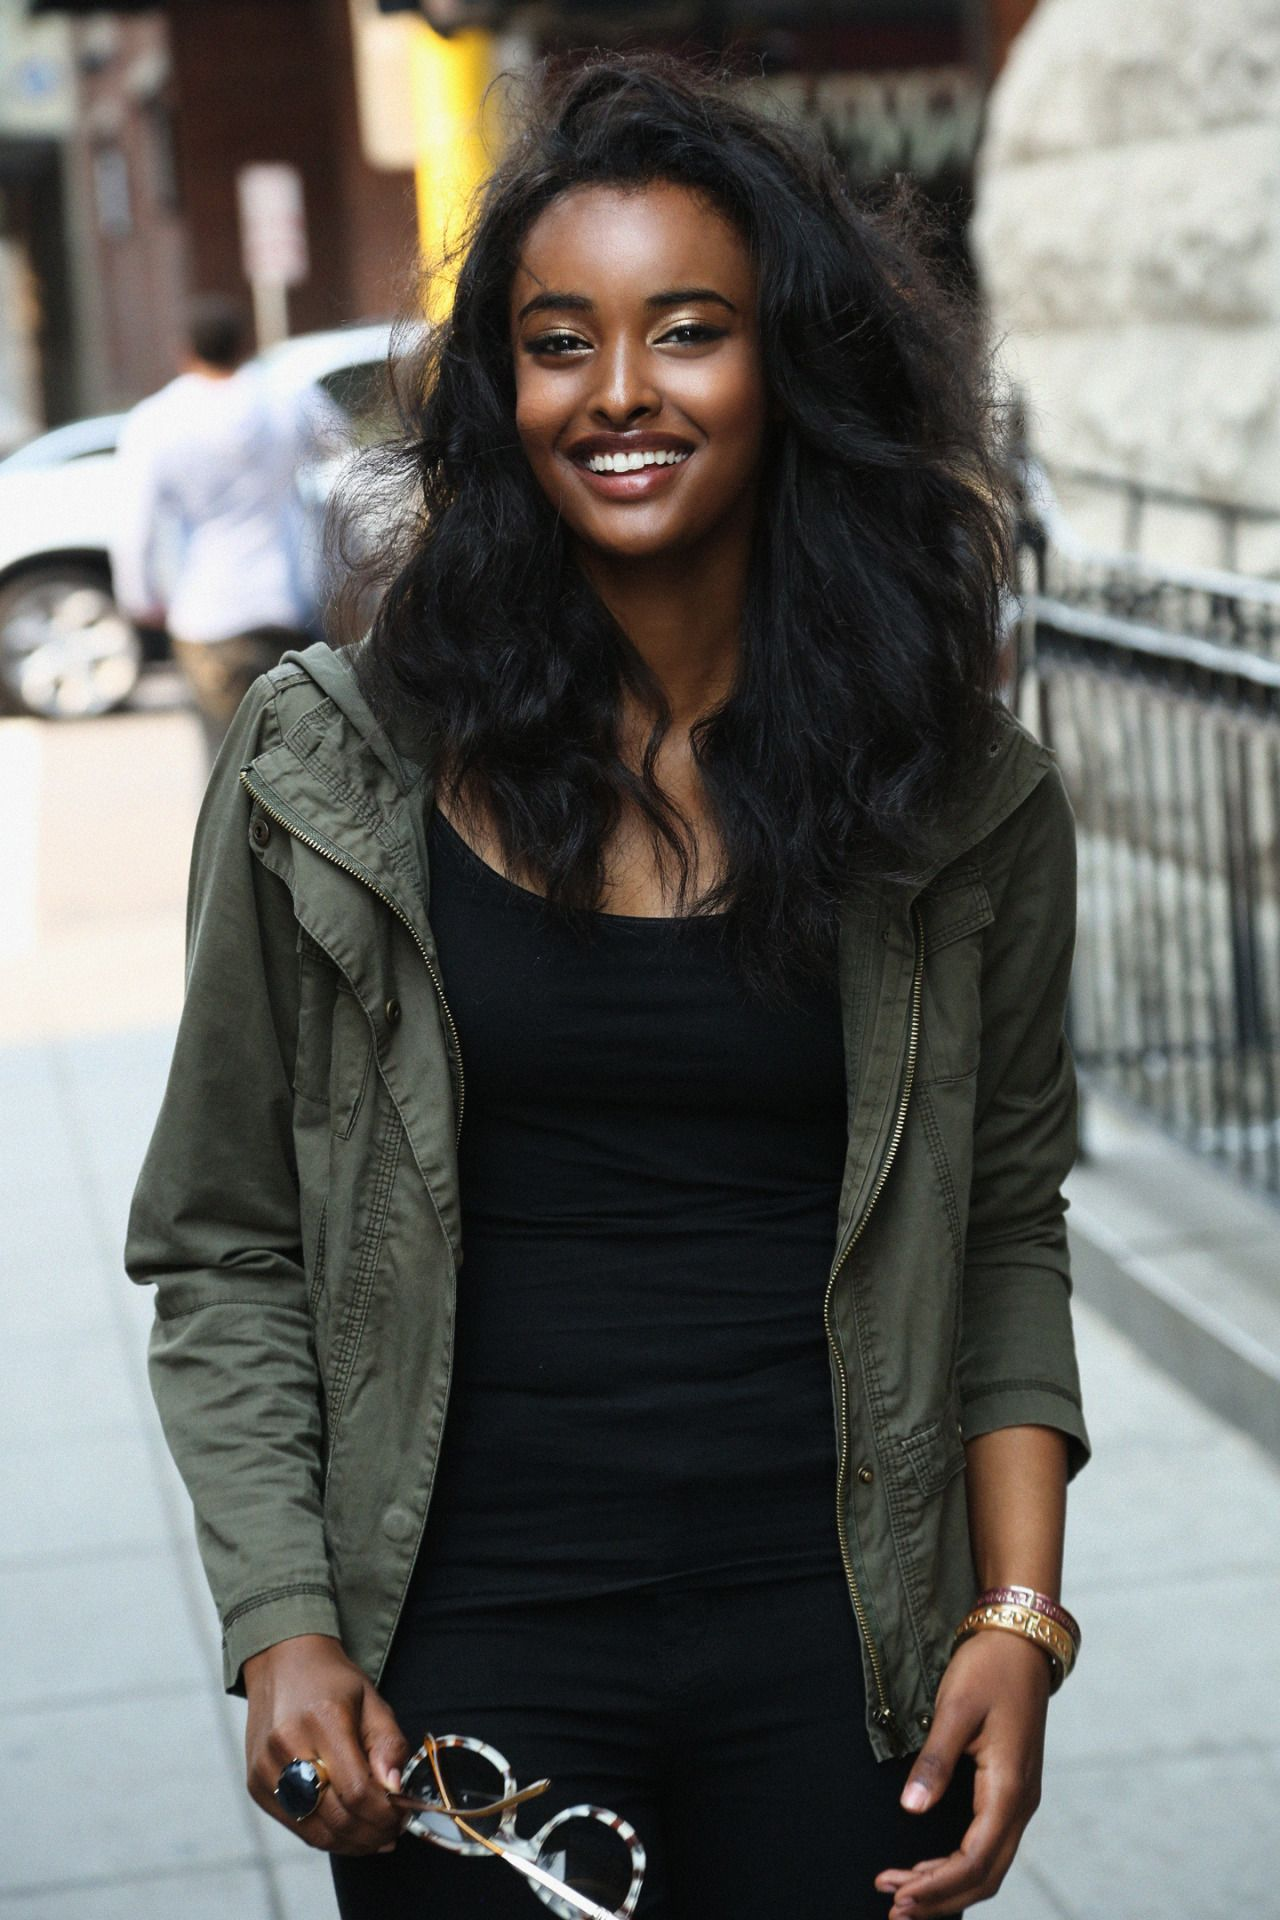 pindallaslifestyl on her fashions | pinterest | dark skinned